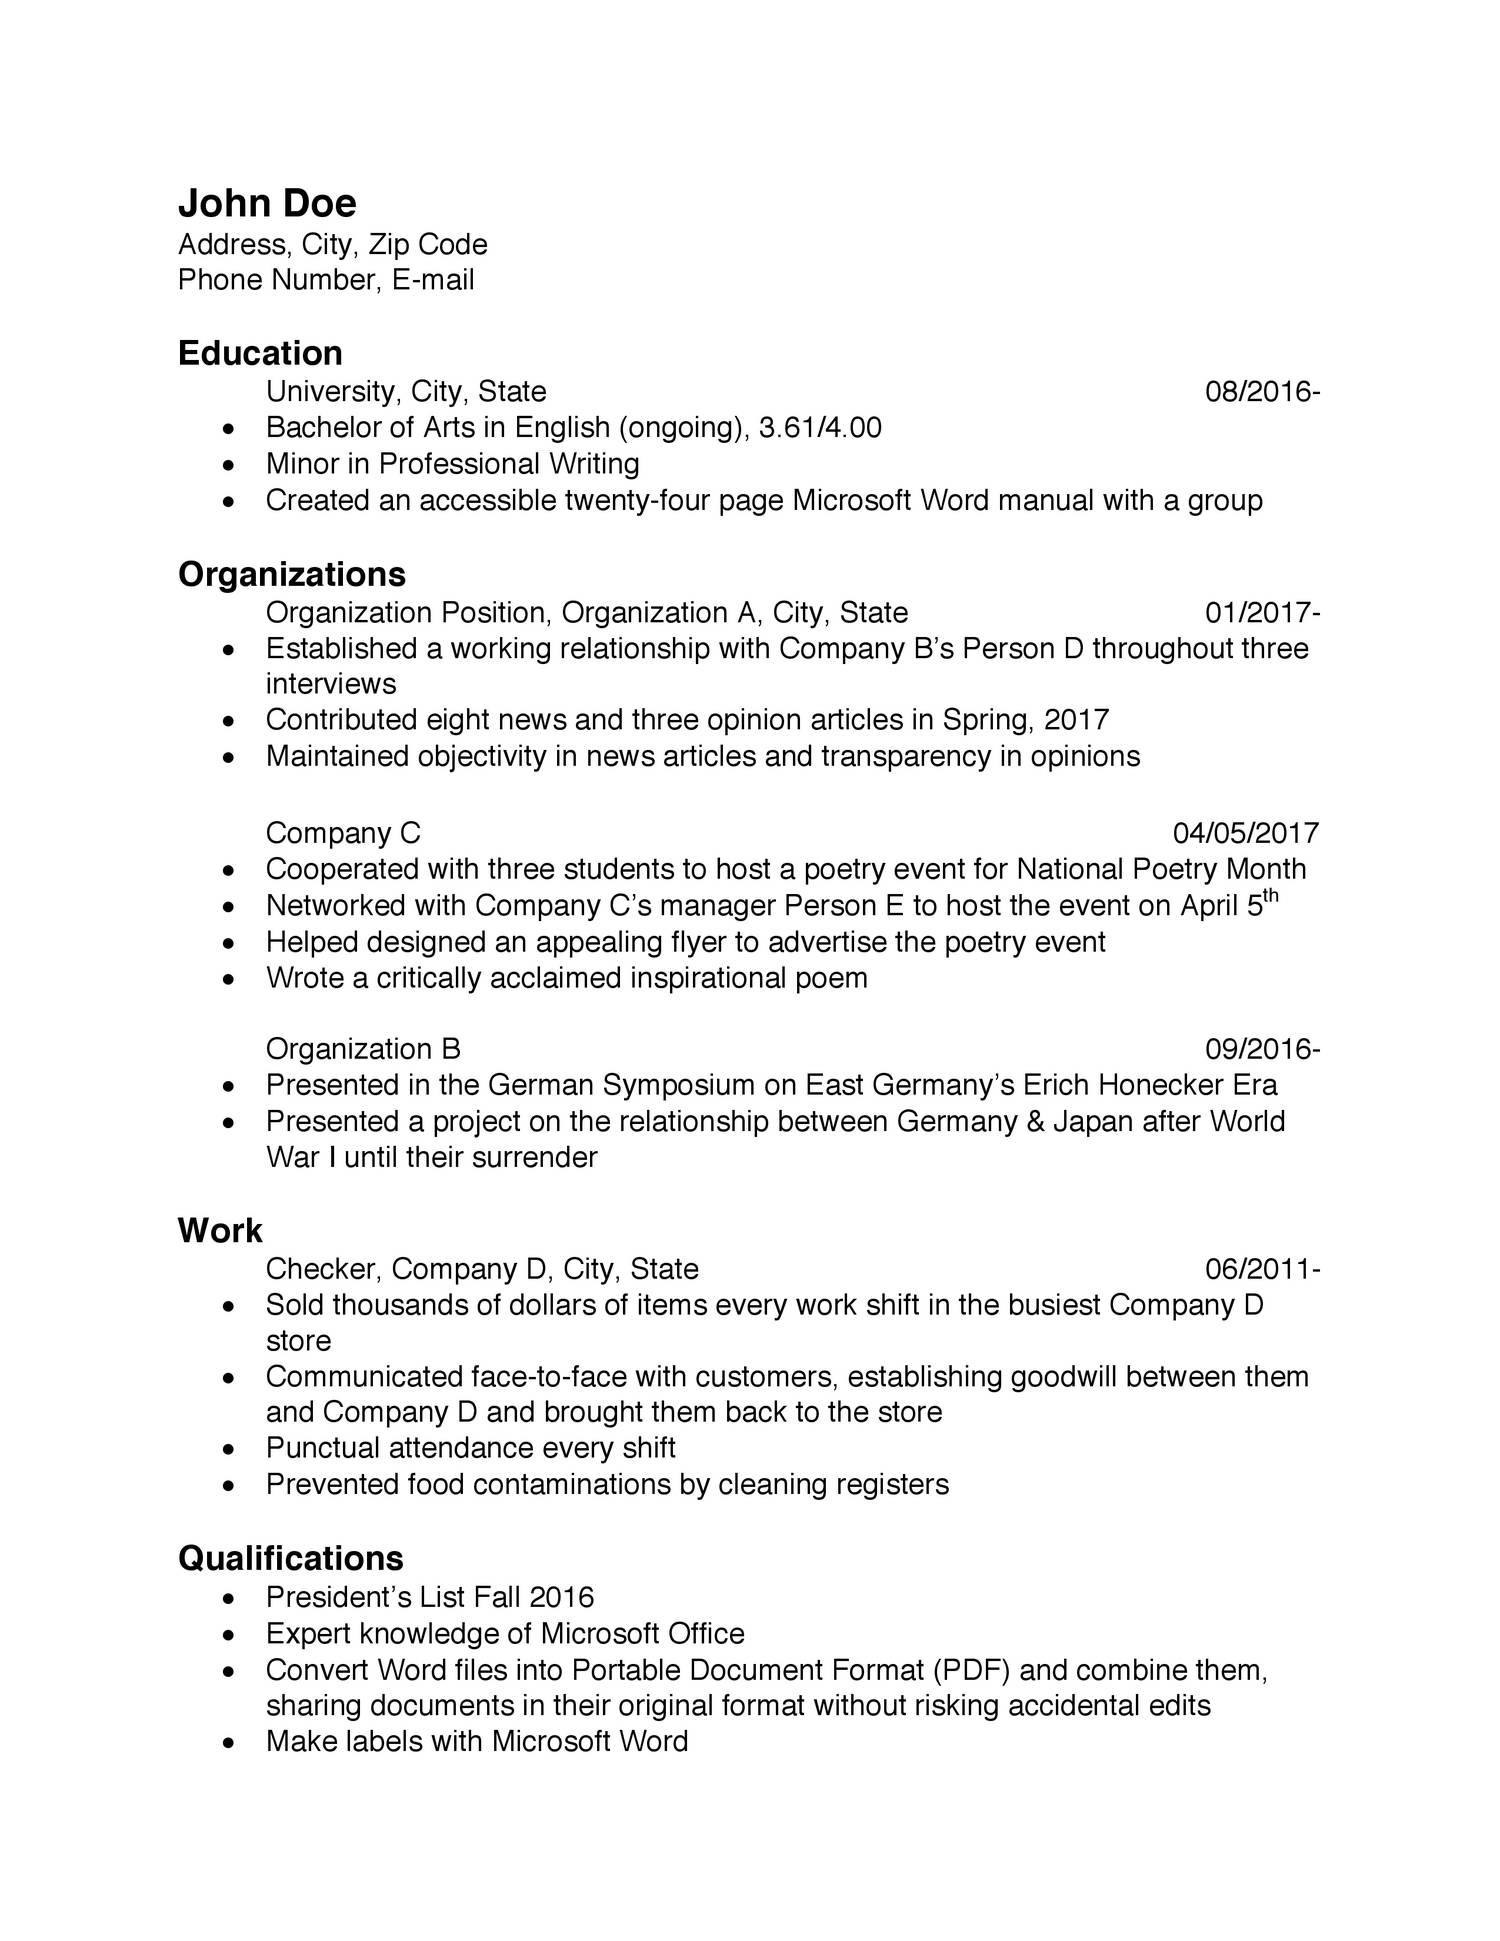 Sample Rsum for Portfolio.pdf | DocDroid